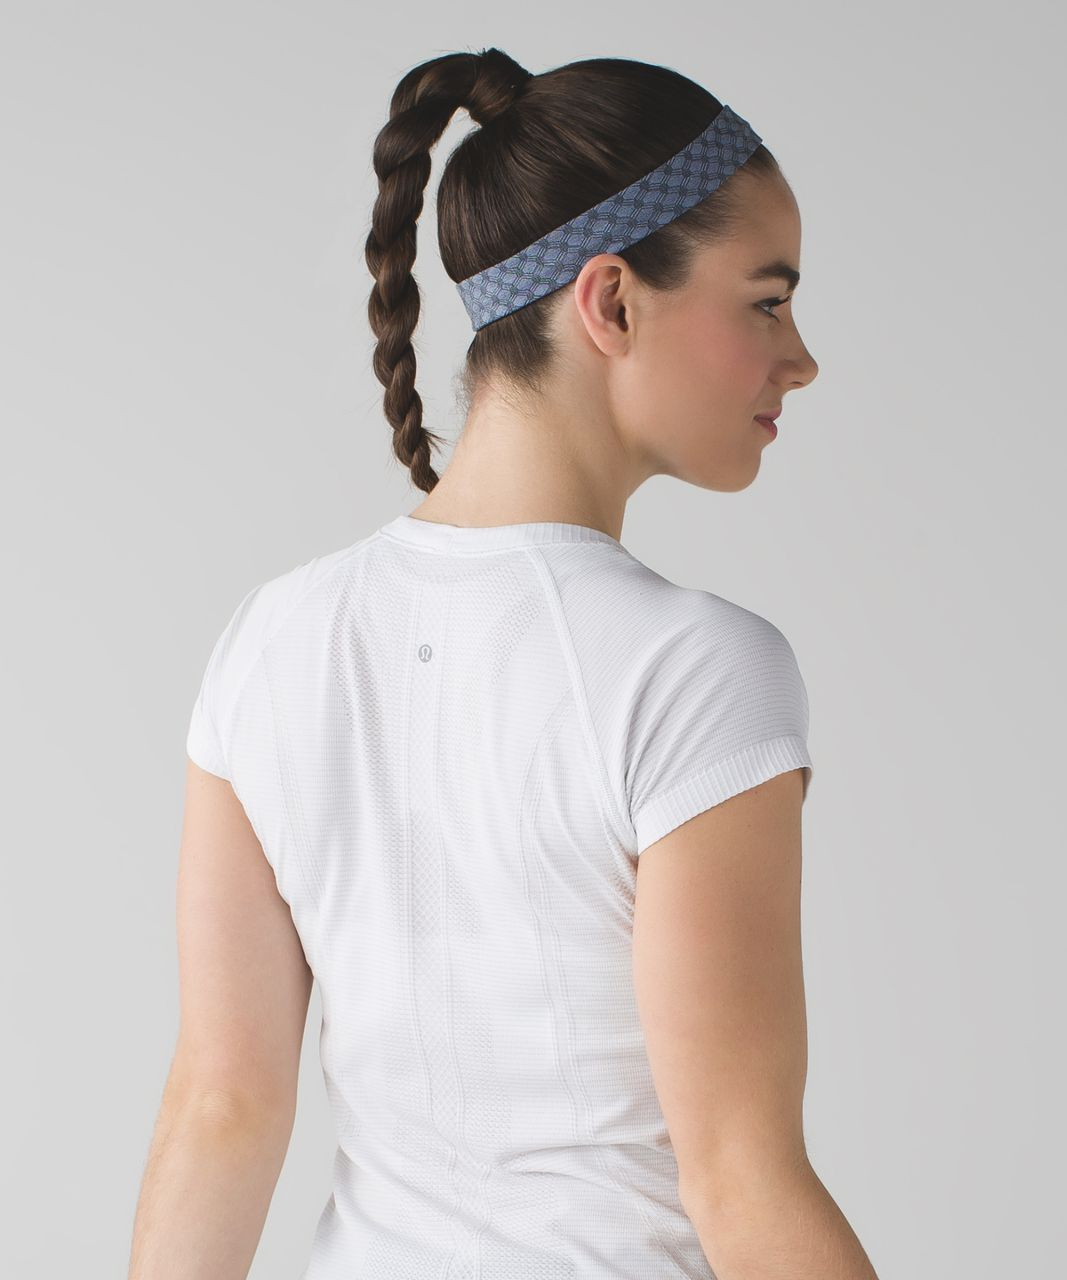 Lululemon Cardio Cross Trainer Headband - Heathered Lullaby (Print)